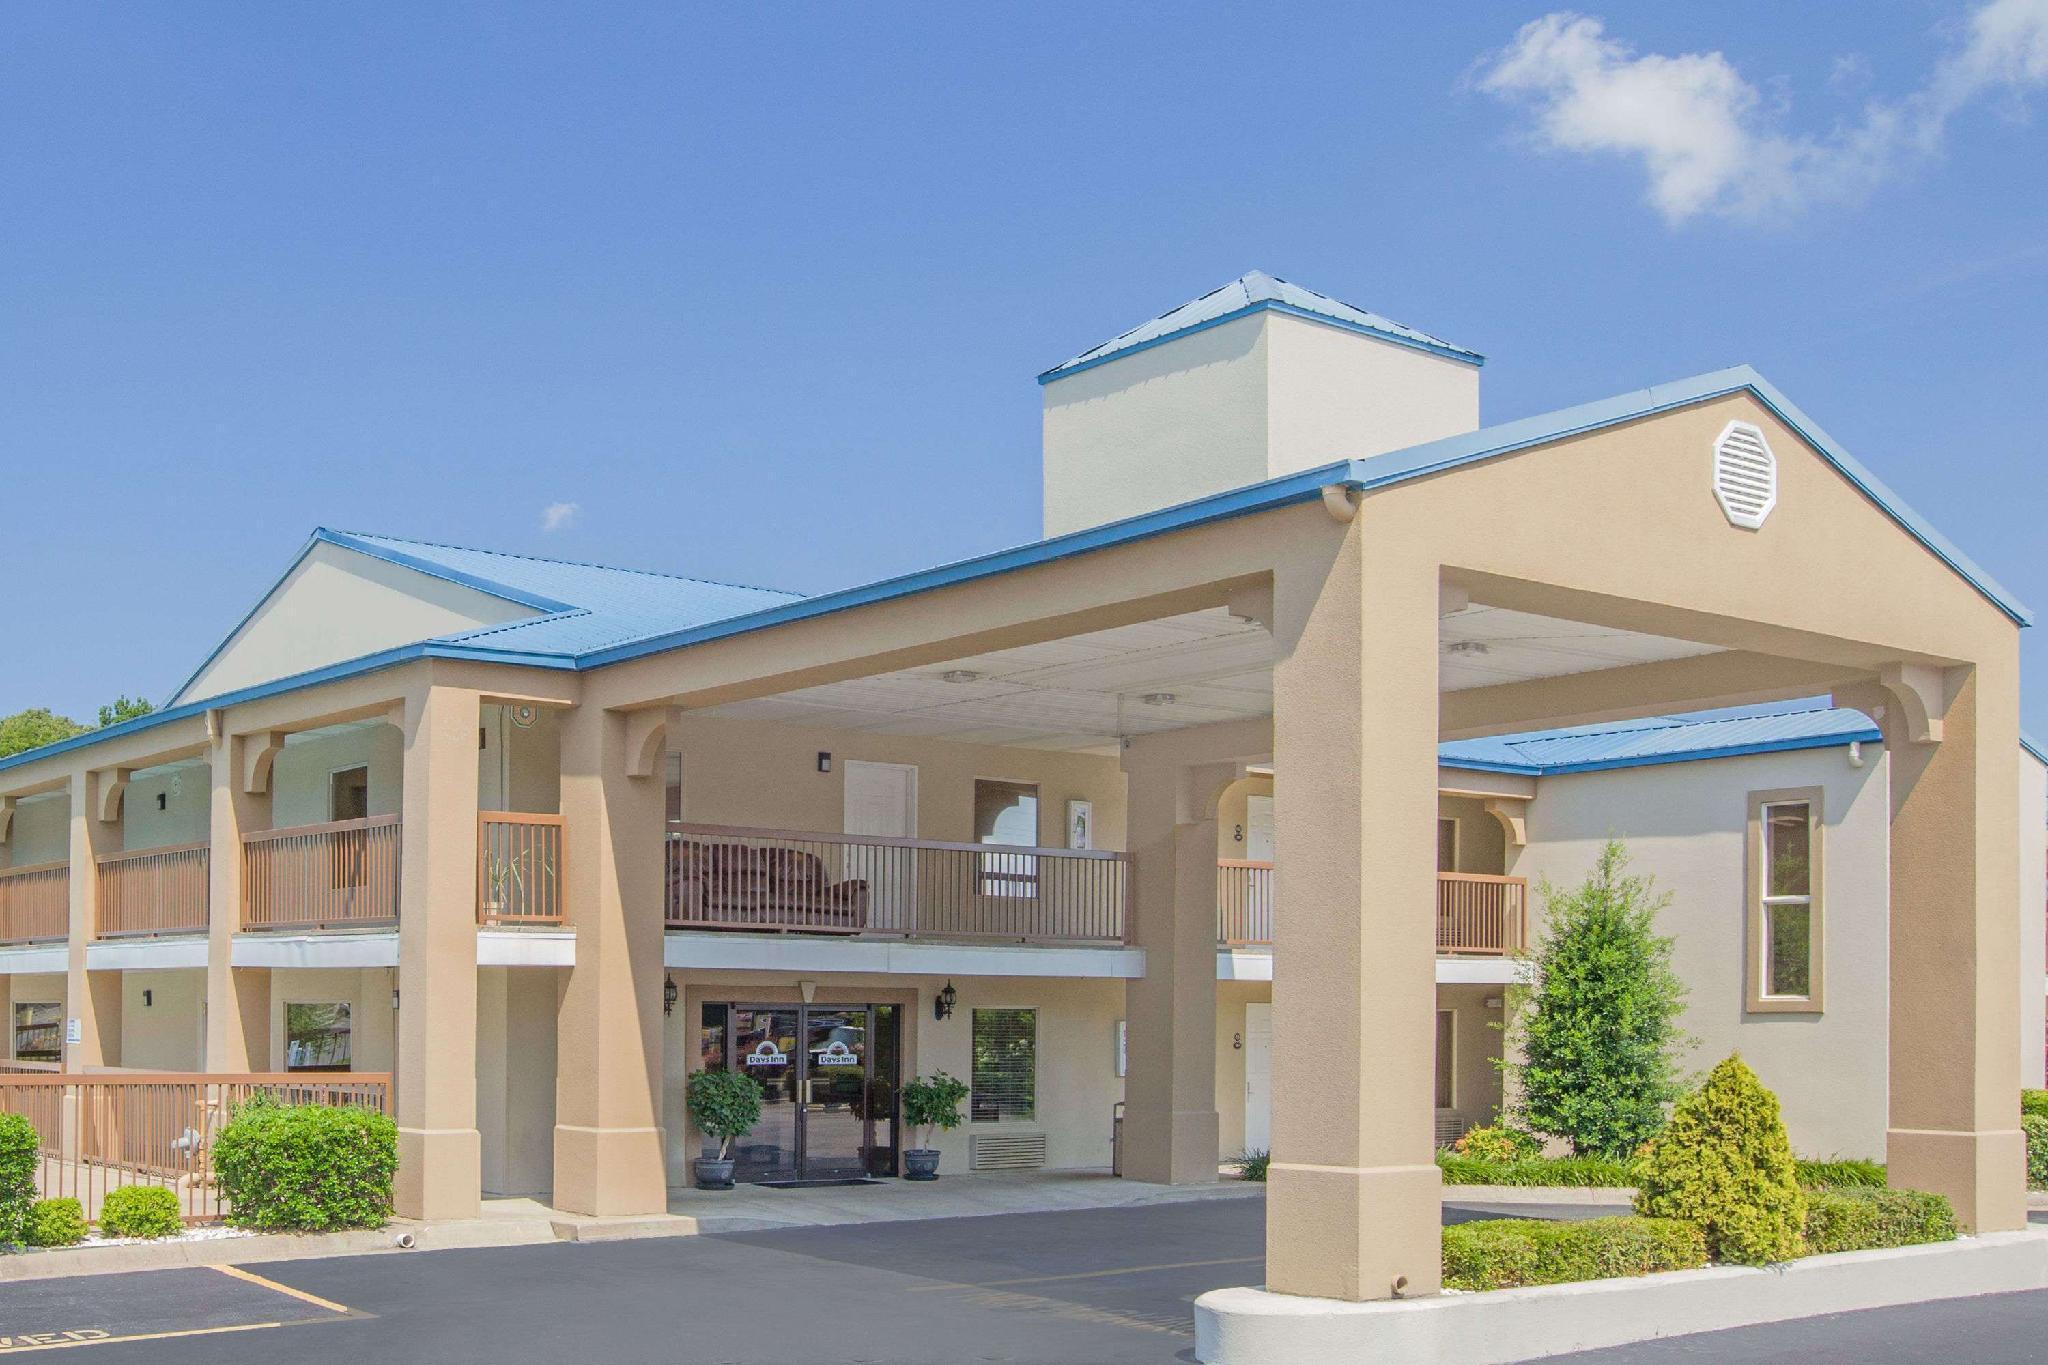 Days Inn And Suites By Wyndham Pine Bluff